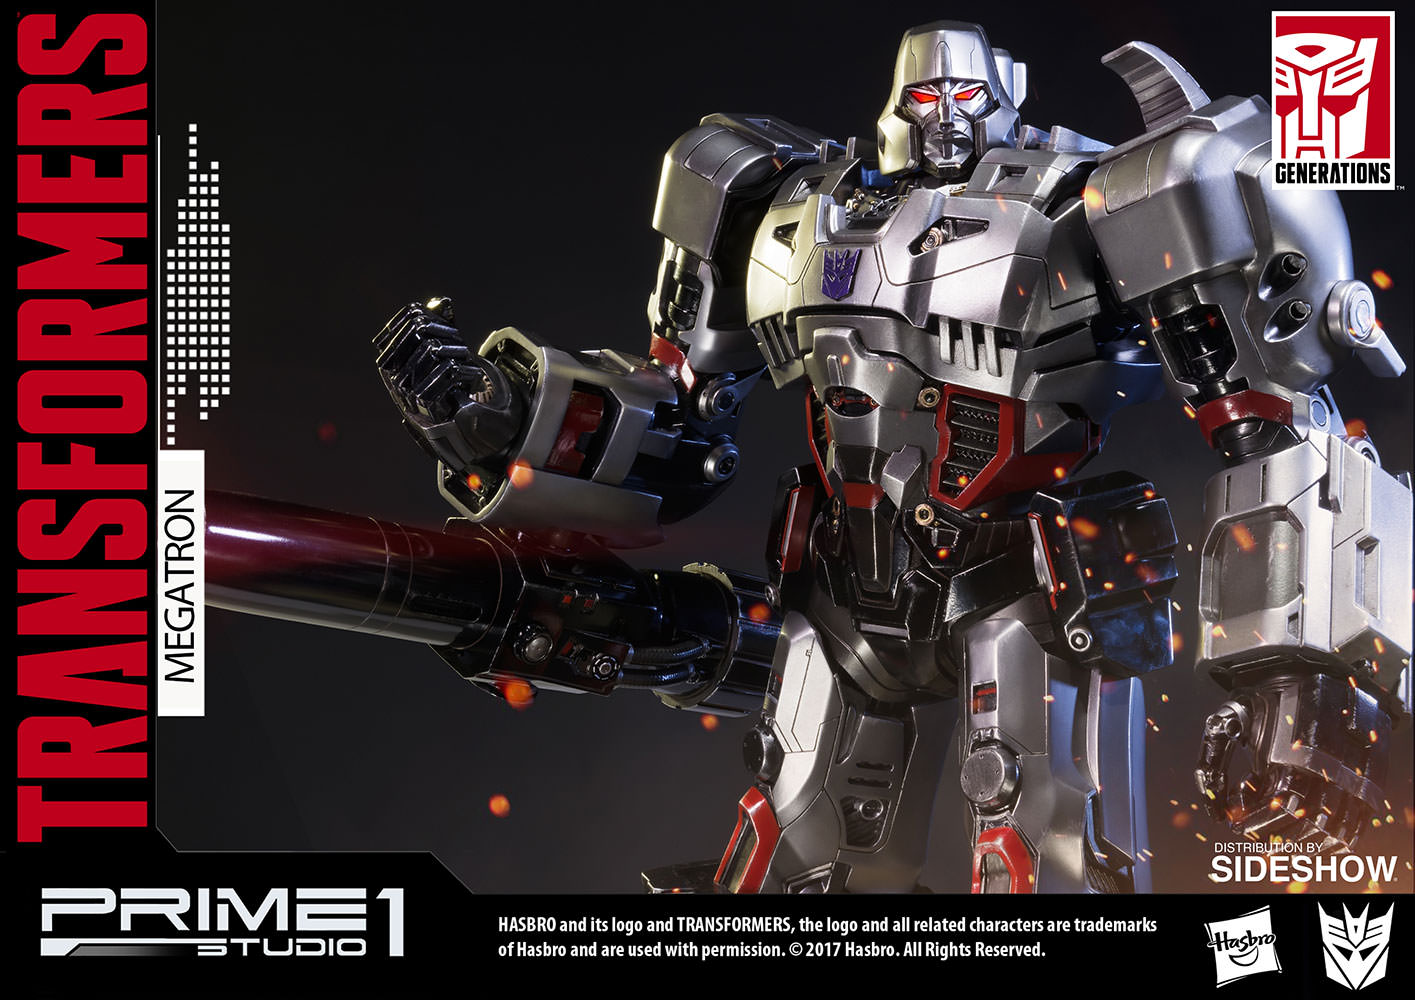 transformers megatron transformers generation 1 statuepr